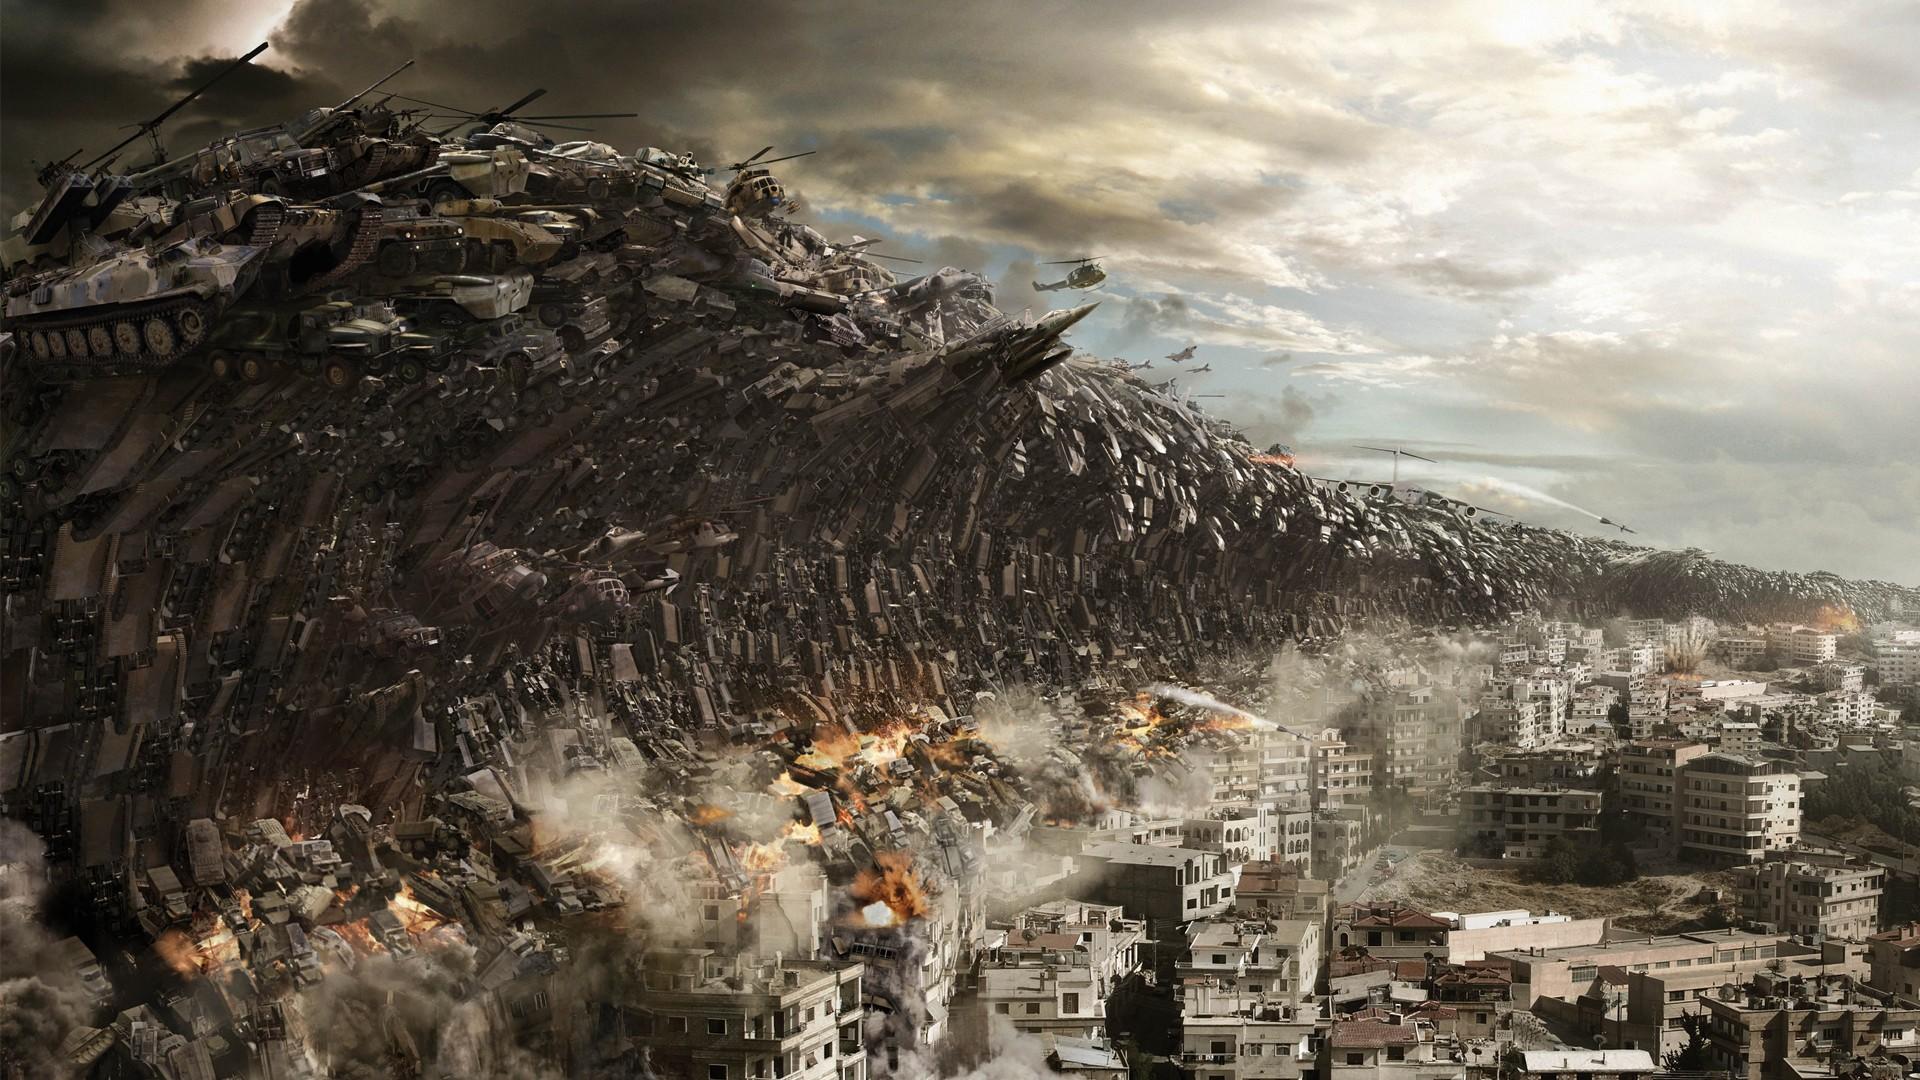 Wallpaper 1920x1080 Px Apocalypse Art Battle Cg